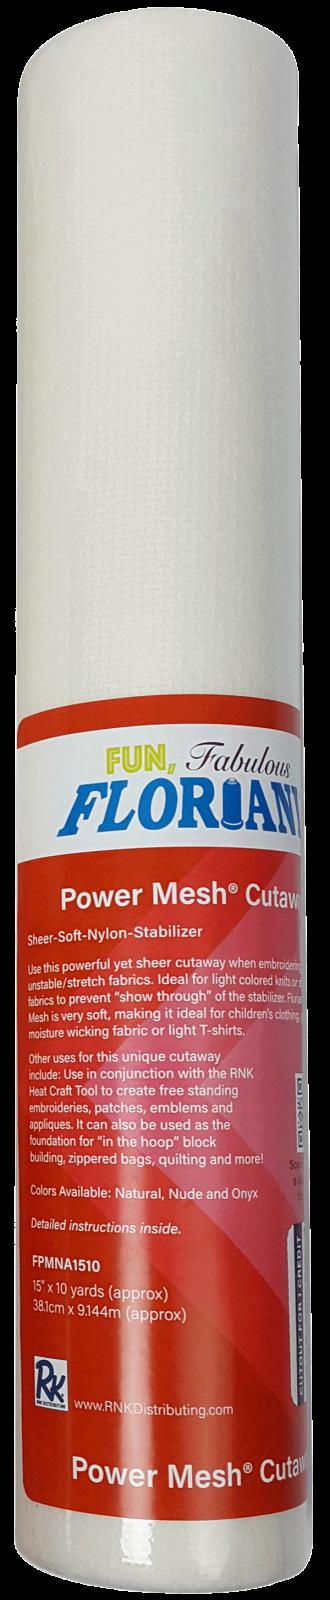 Power Mesh Cutaway : Natural Sheer Soft Nylon Stabilizer - 15 x 10yrds - Floriani